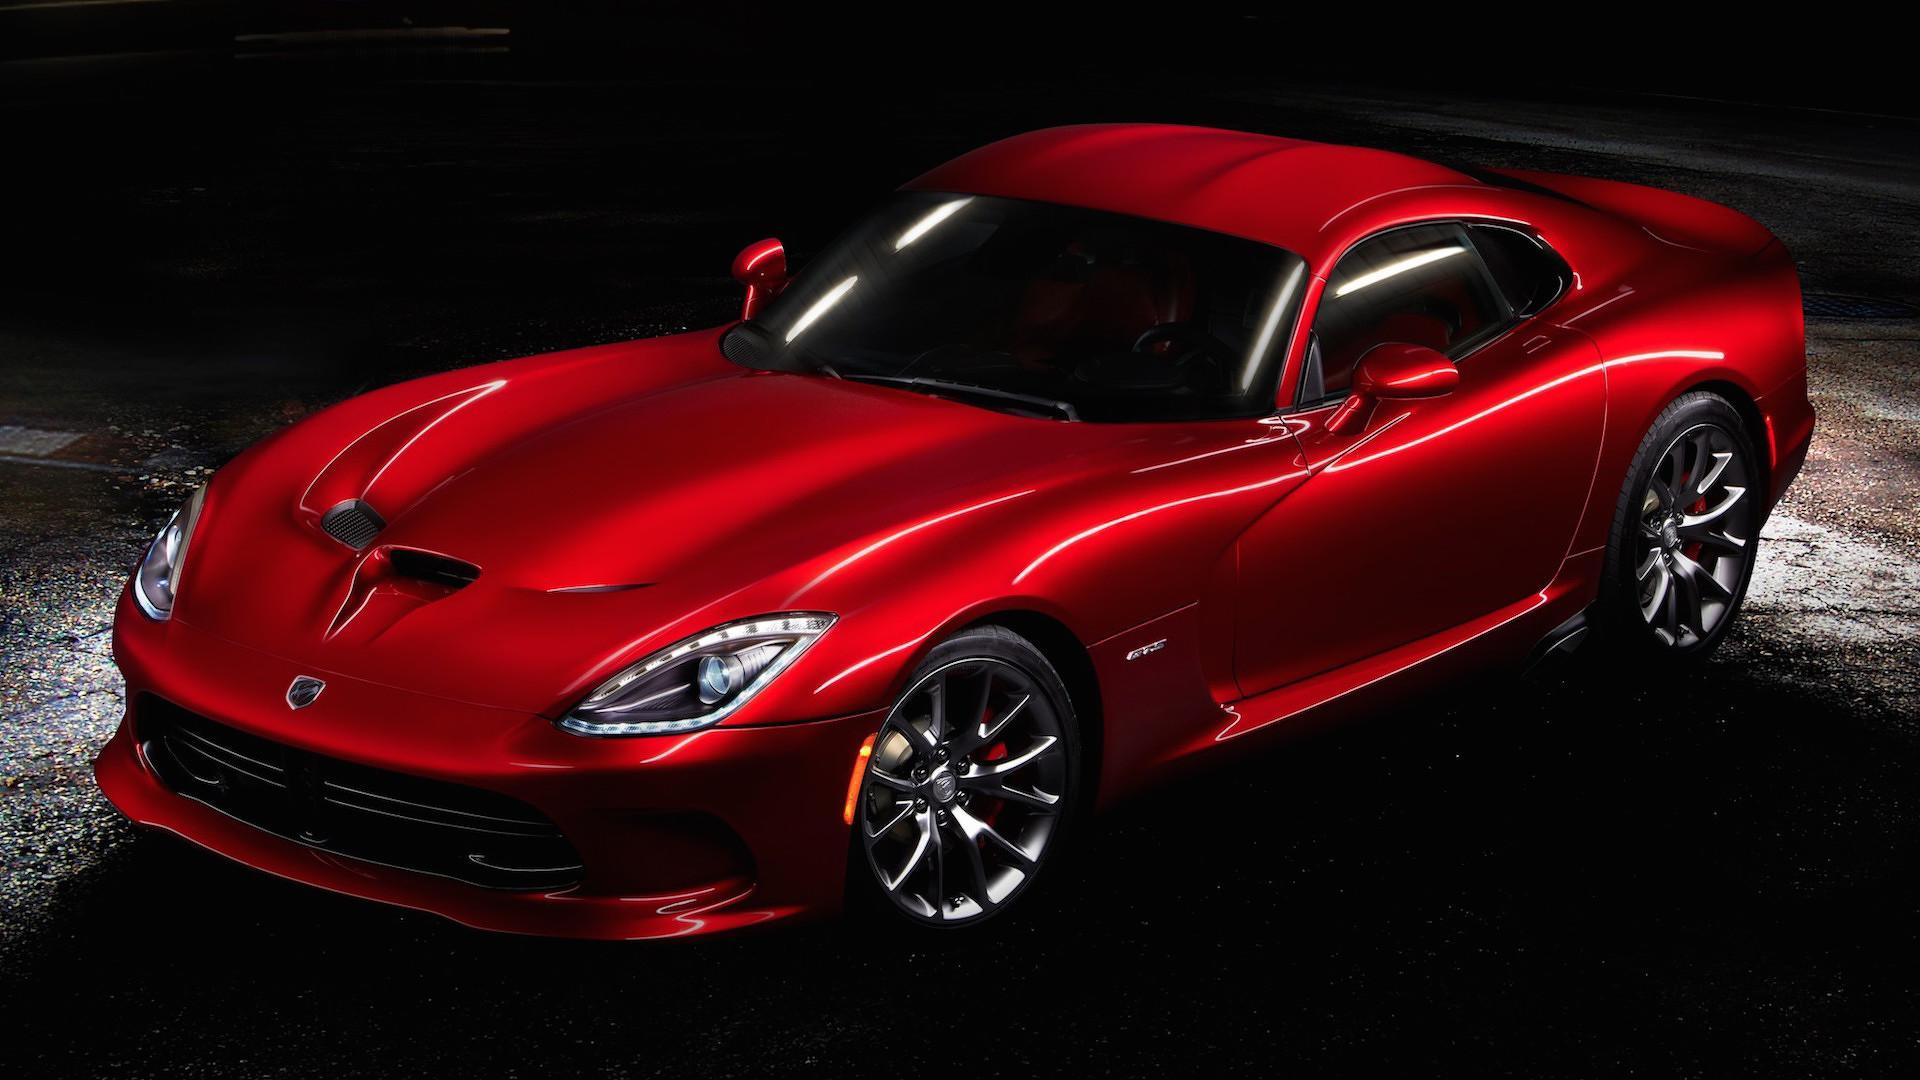 Dodge Viper News and Reviews | Motor1.com